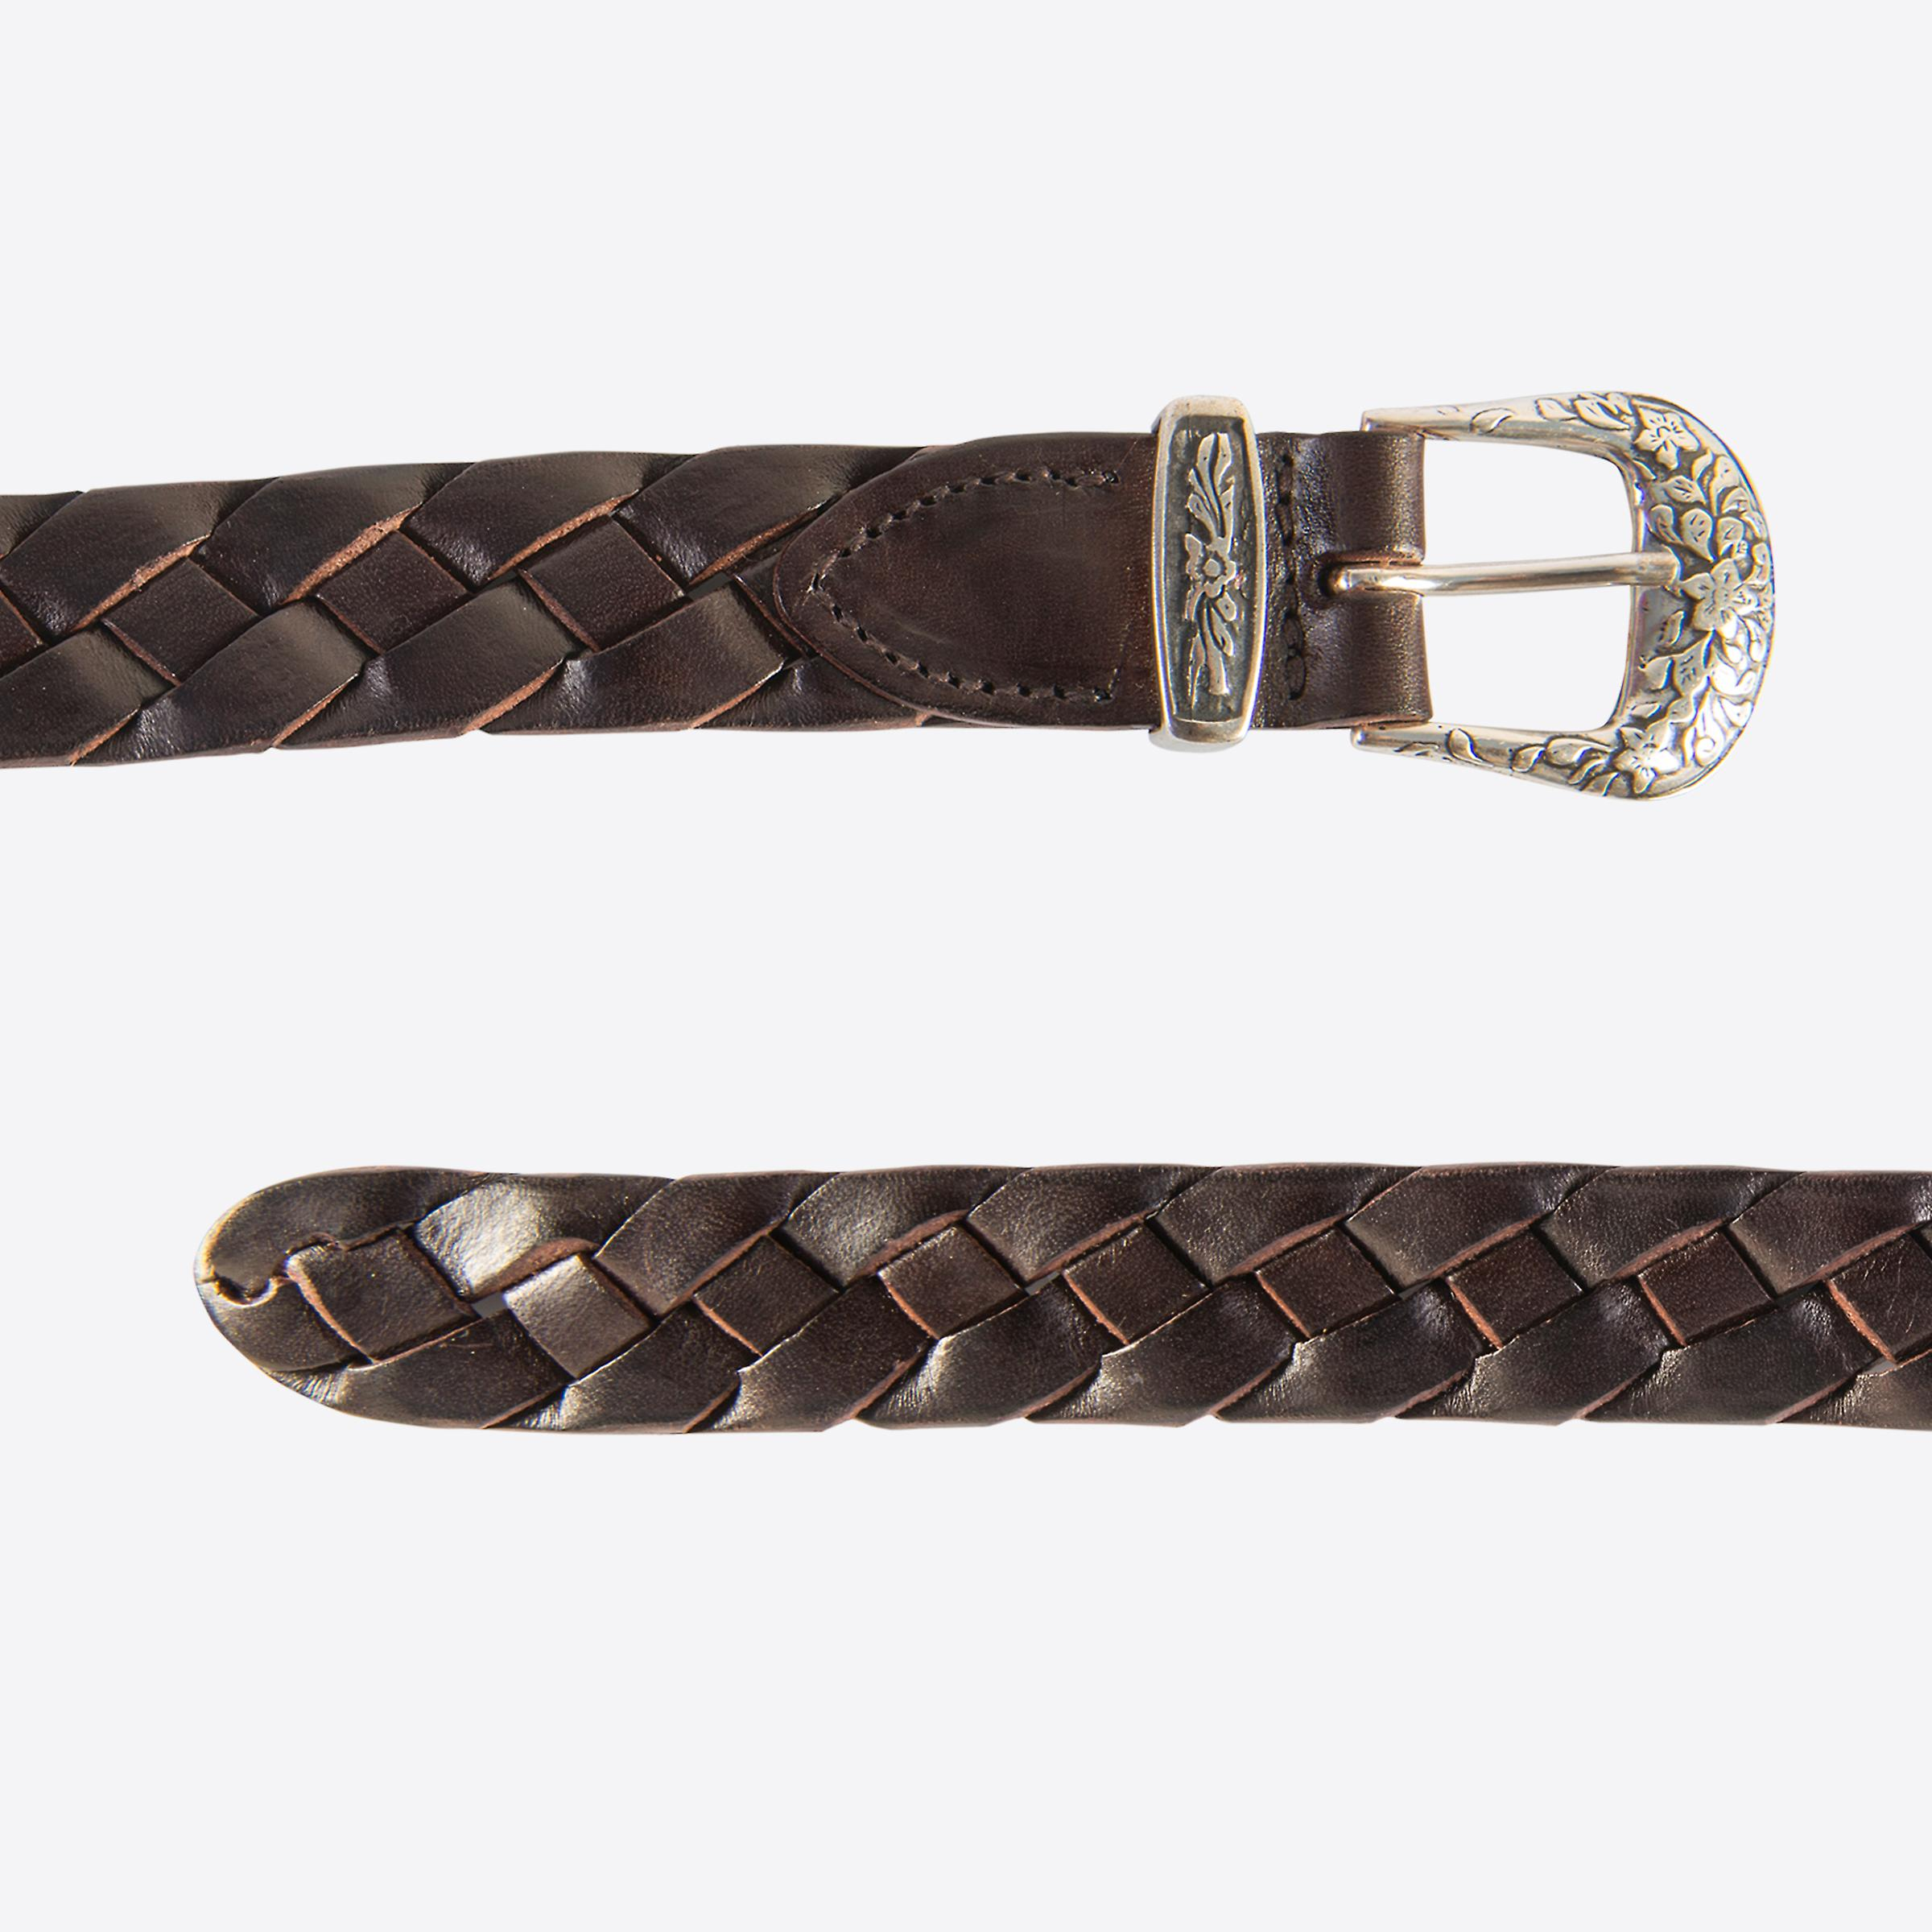 Fabio Giovanni Casone Belt - High Quality Woven Leather Belt